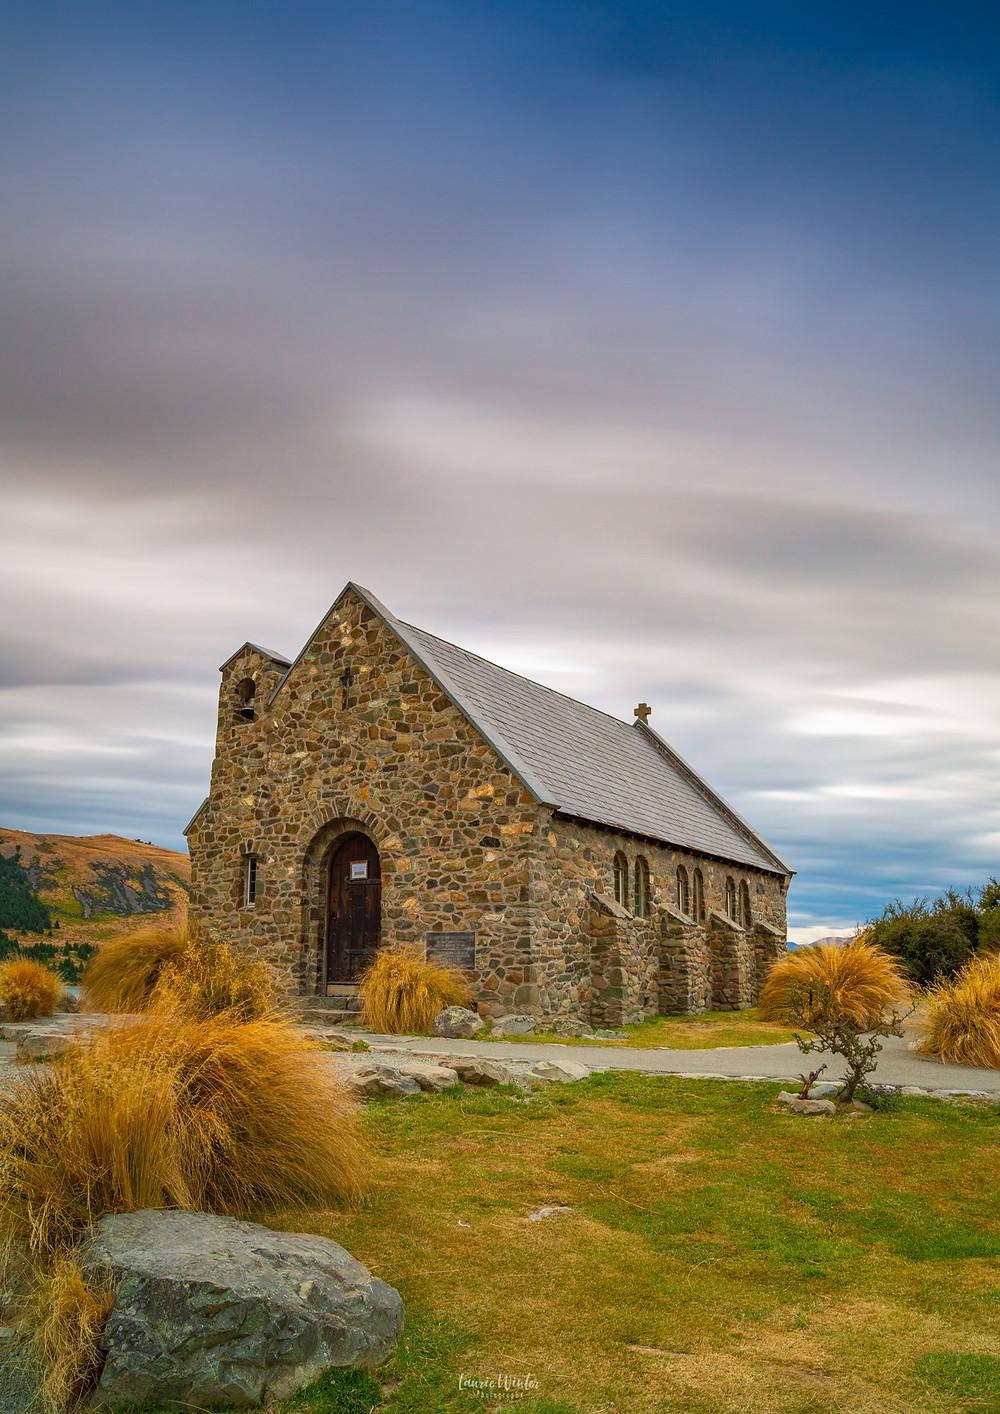 Cloudy skies at Church of the Good Shepherd in Tekapo New Zealand